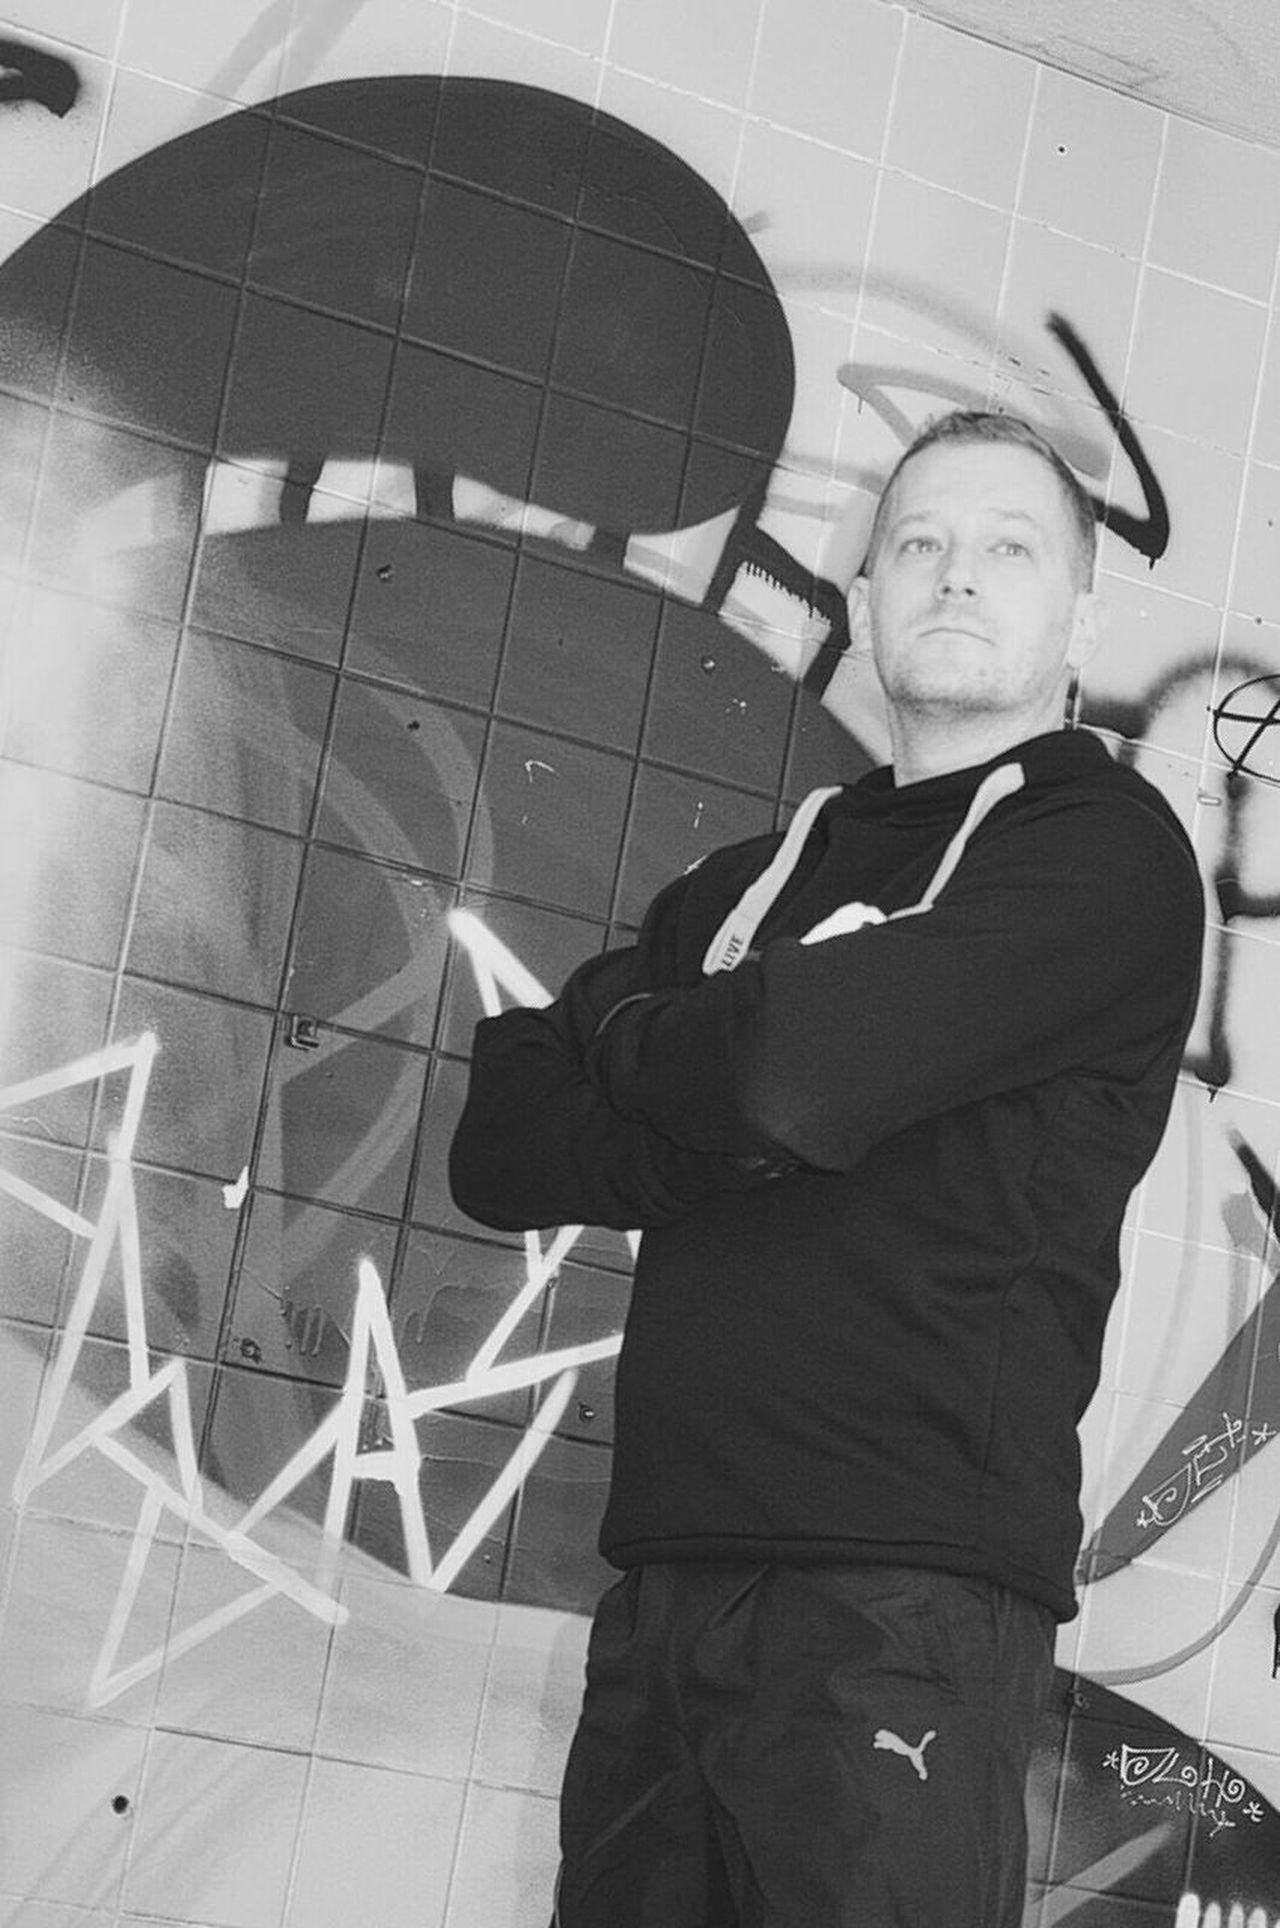 Kravmaga selfdefense One Person Real People Standing Portrait One Man Only People Me Myself And I Tactical Hamburg The Portraitist - 2017 EyeEm Awards EyeEmNewHere The Street Photographer - 2017 EyeEm Awards BYOPaper! The Photojournalist - 2017 EyeEm Awards